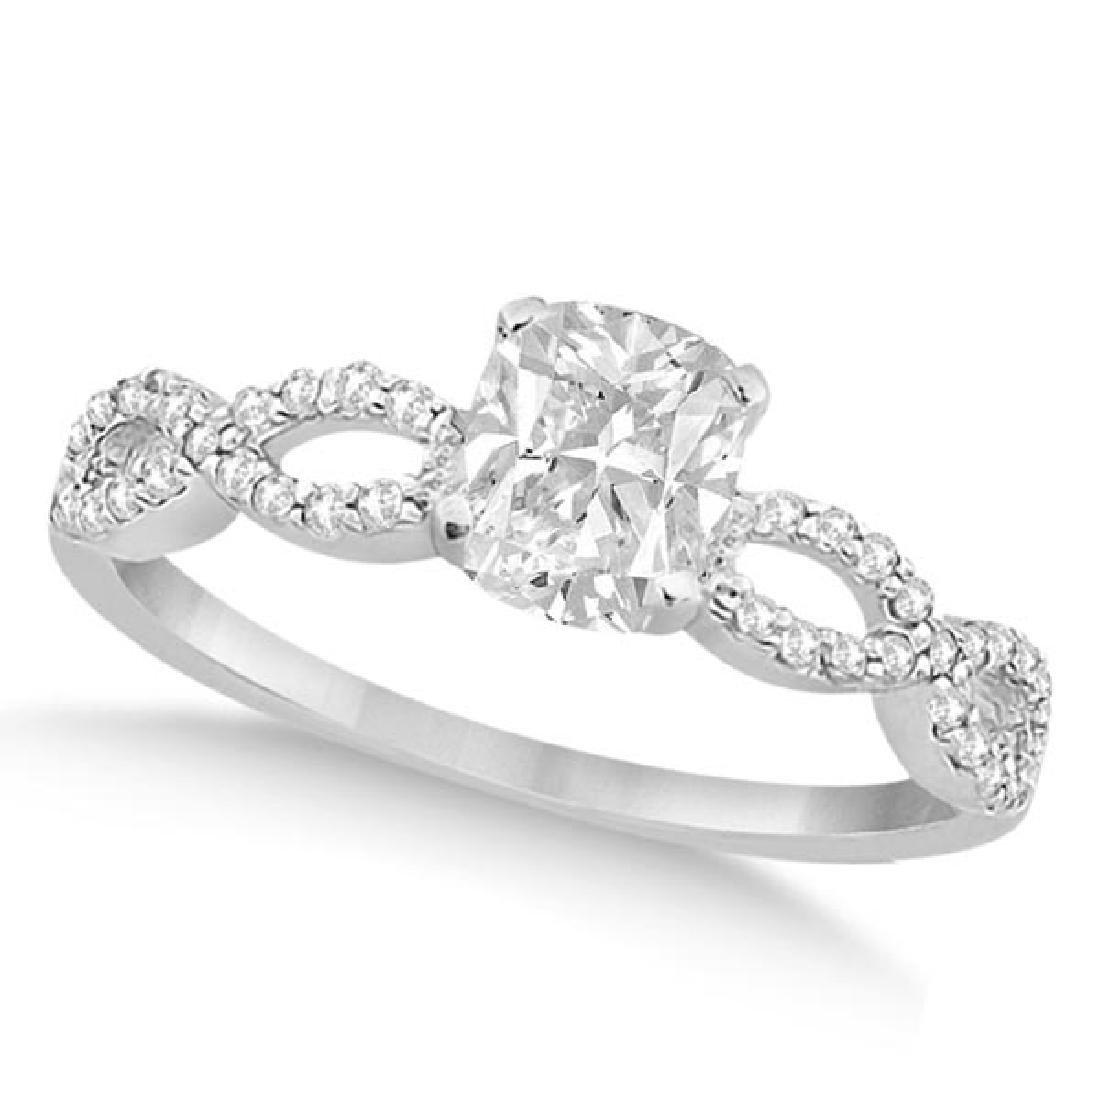 Infinity Cushion-Cut Diamond Engagement Ring 14k White